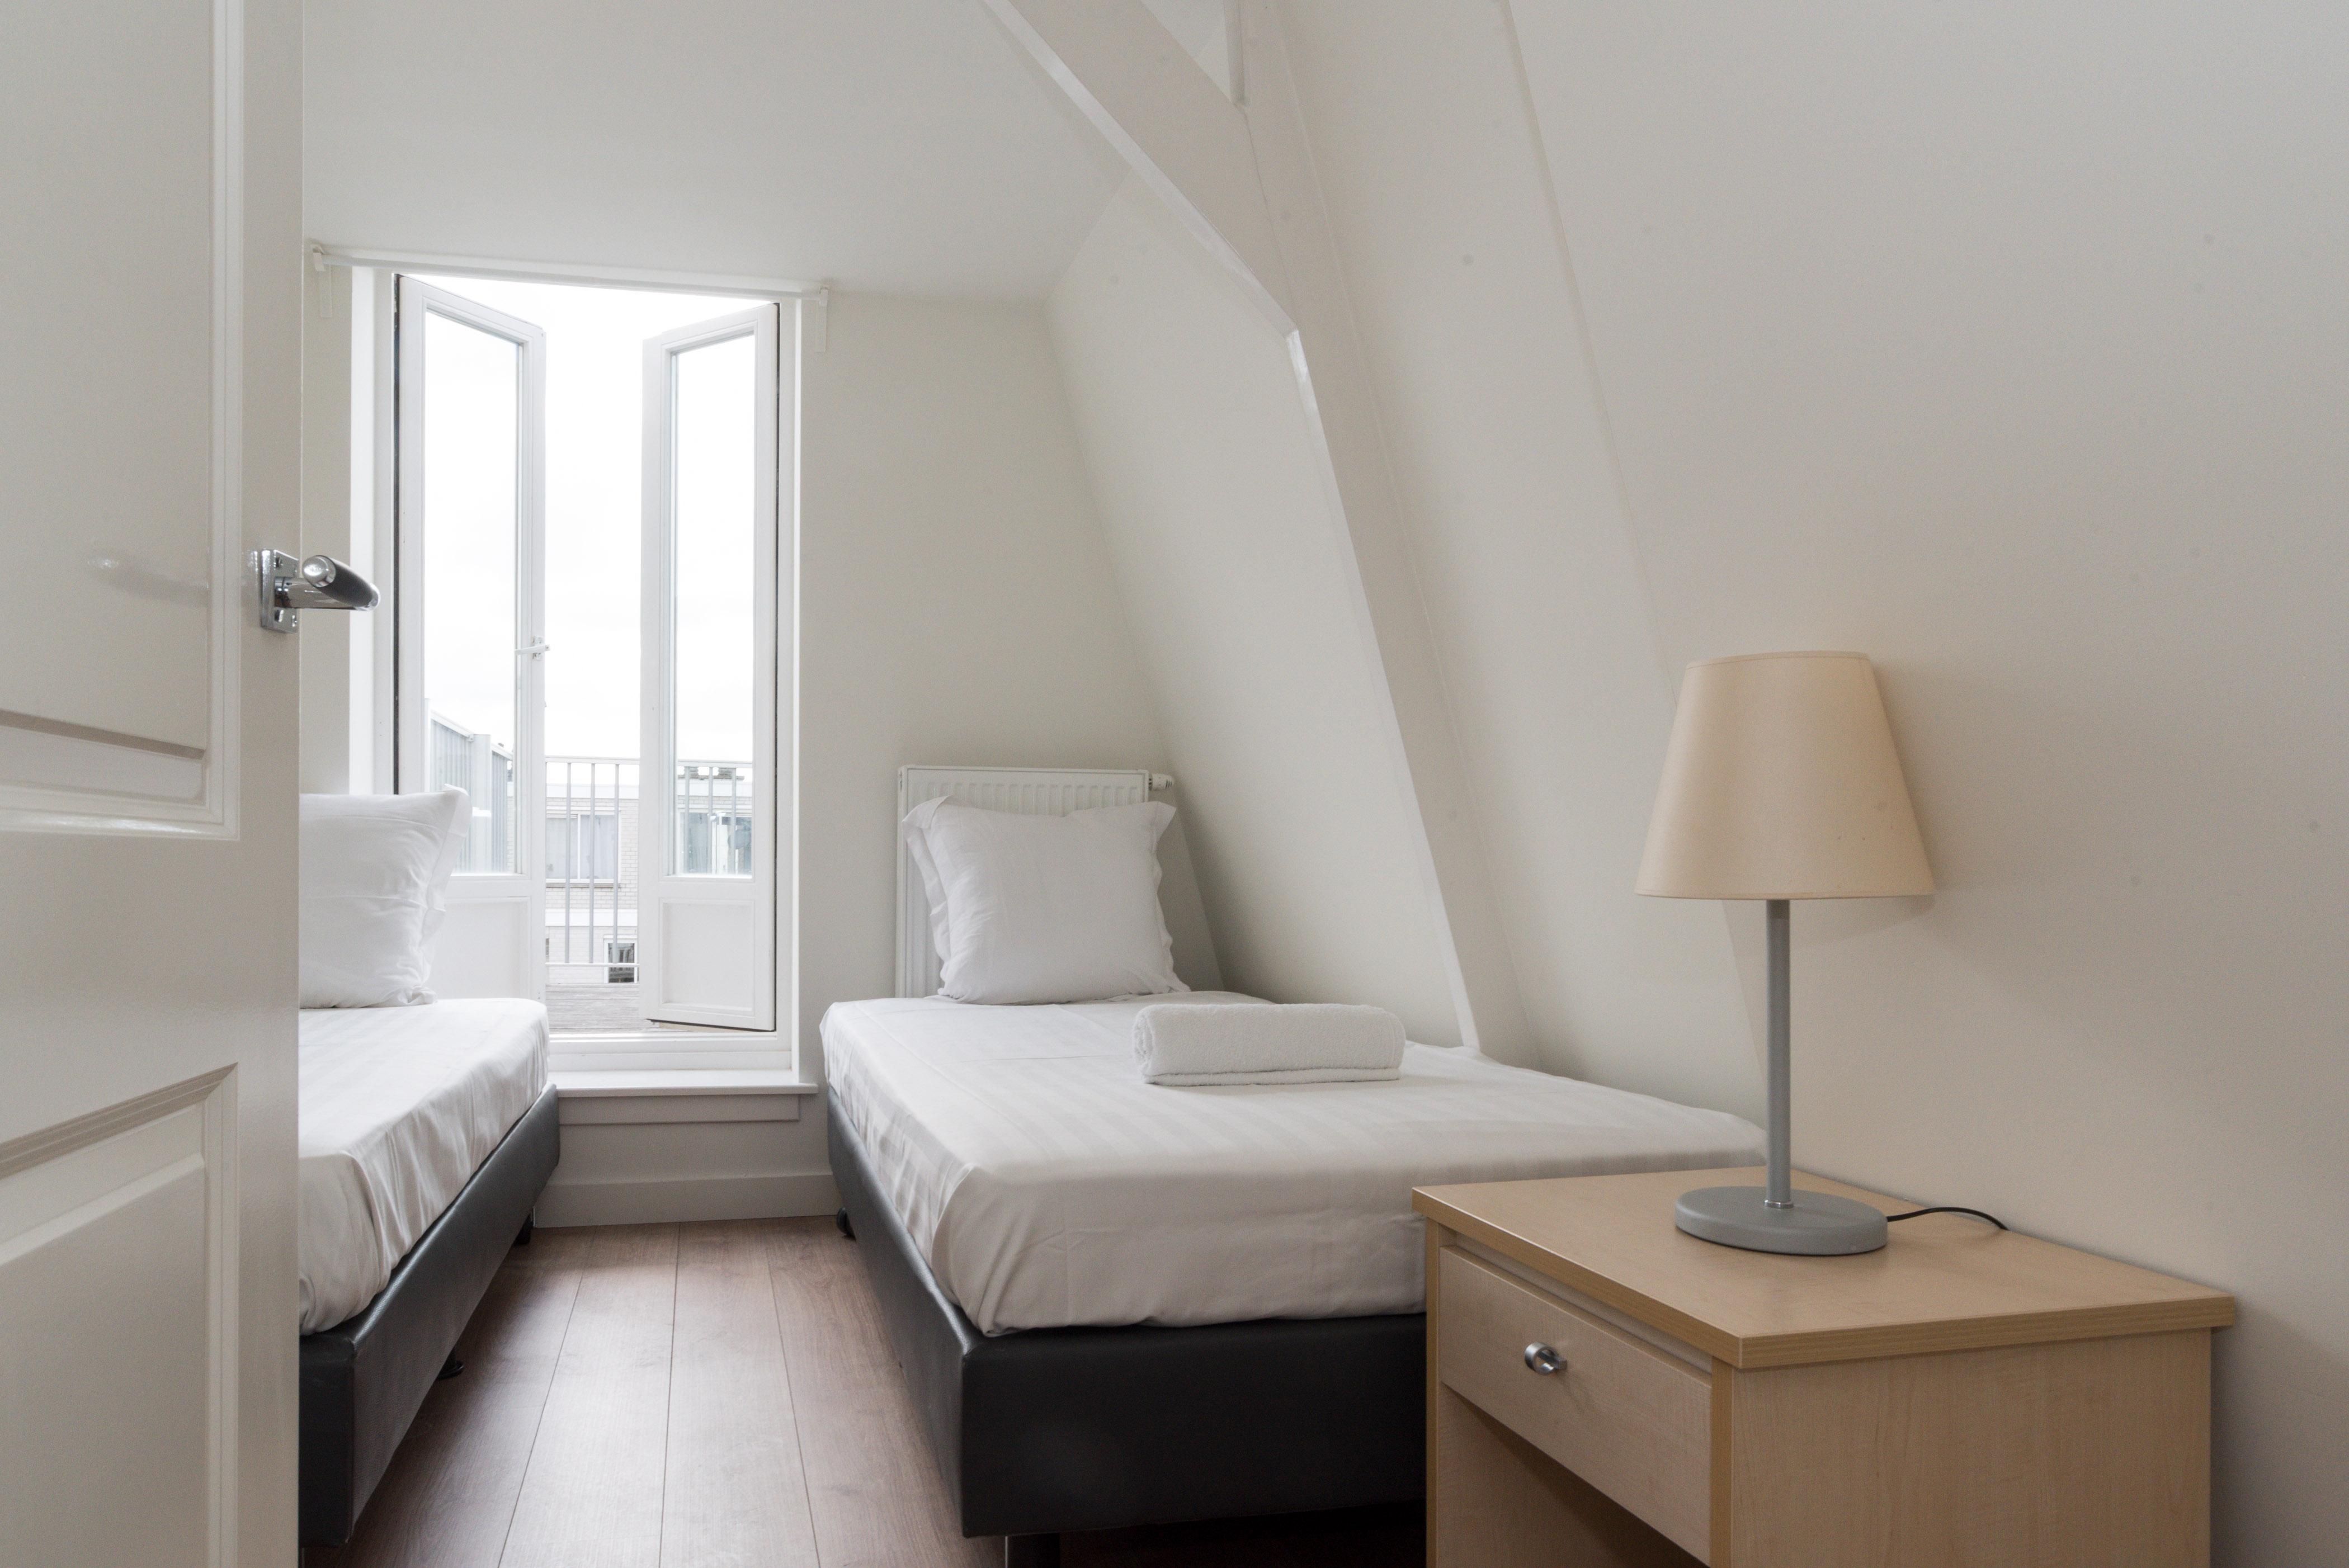 Apartment Amsterdam Apartments Penthouse Building 2 photo 20489944